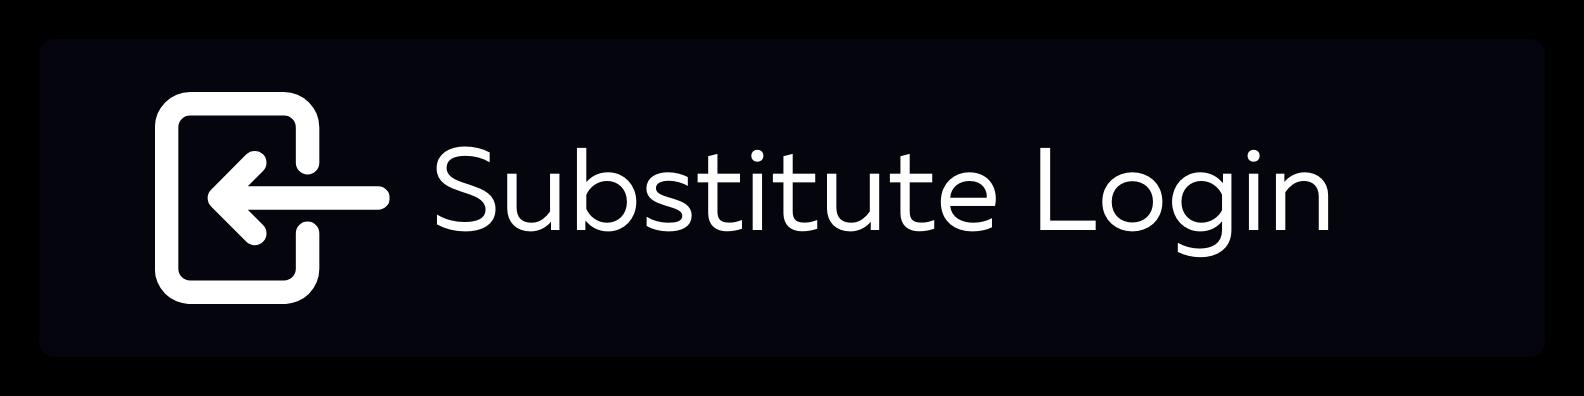 Substitute Login Button